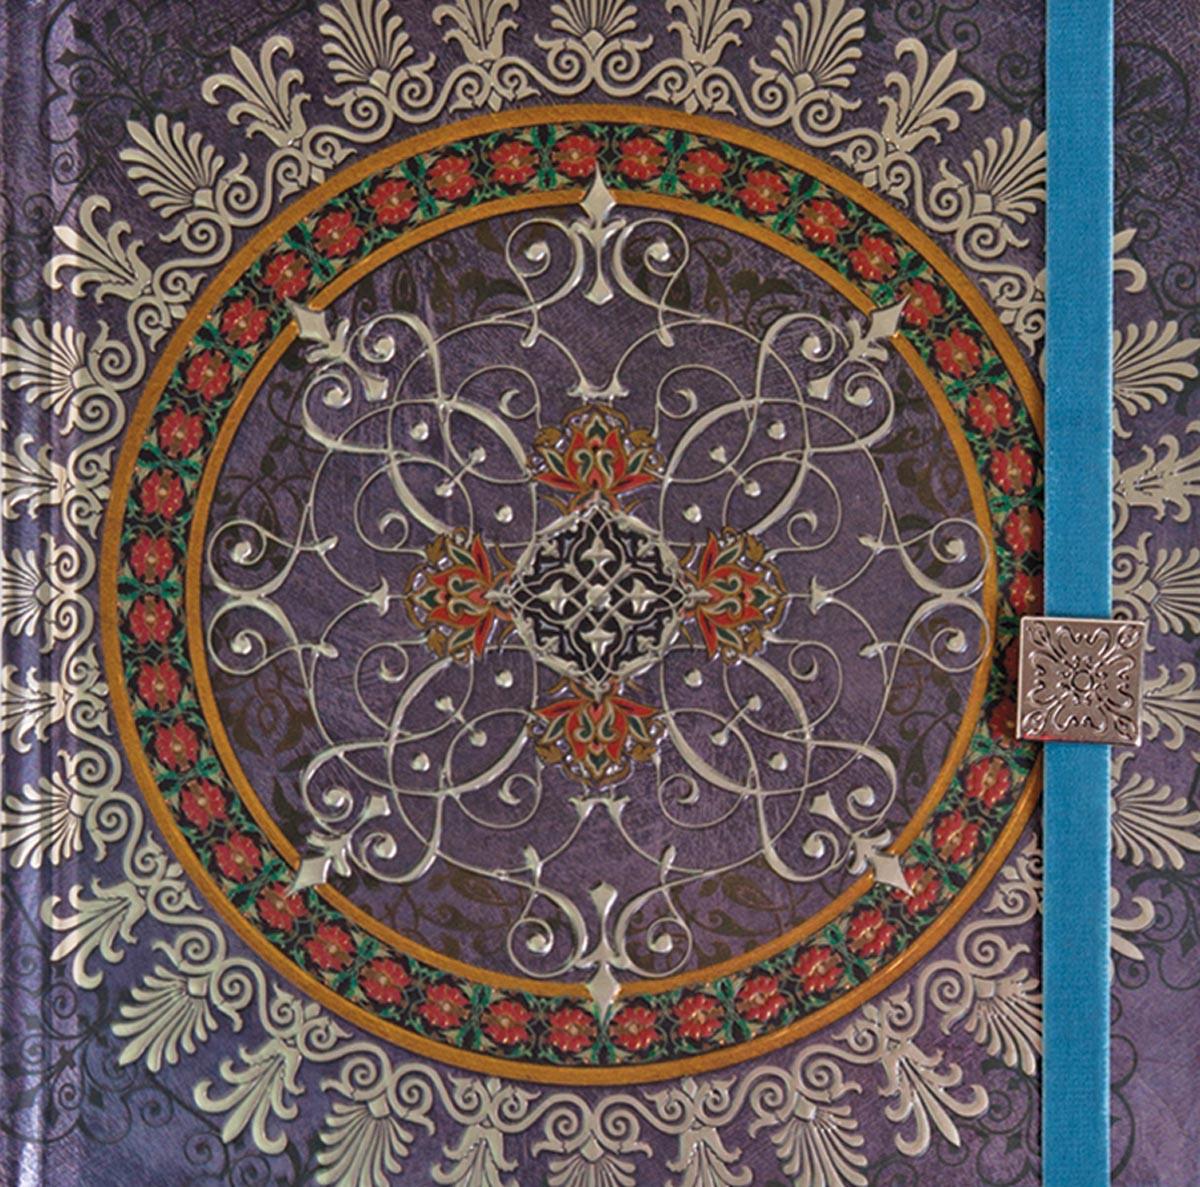 Boncahier - Mandalas - 9018